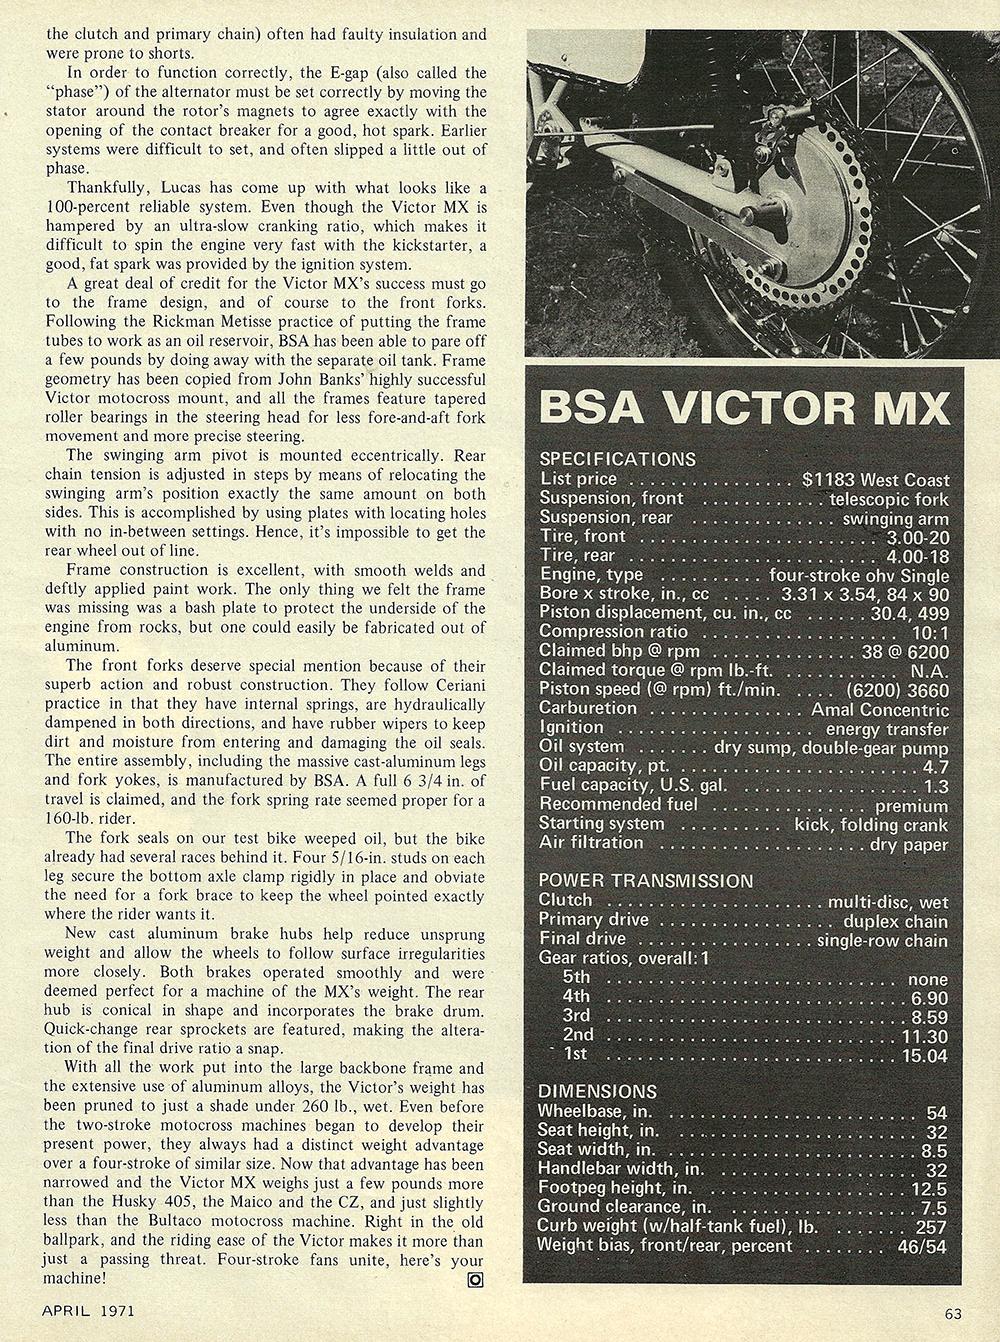 1971 BSA Victor MX road test 04.jpg